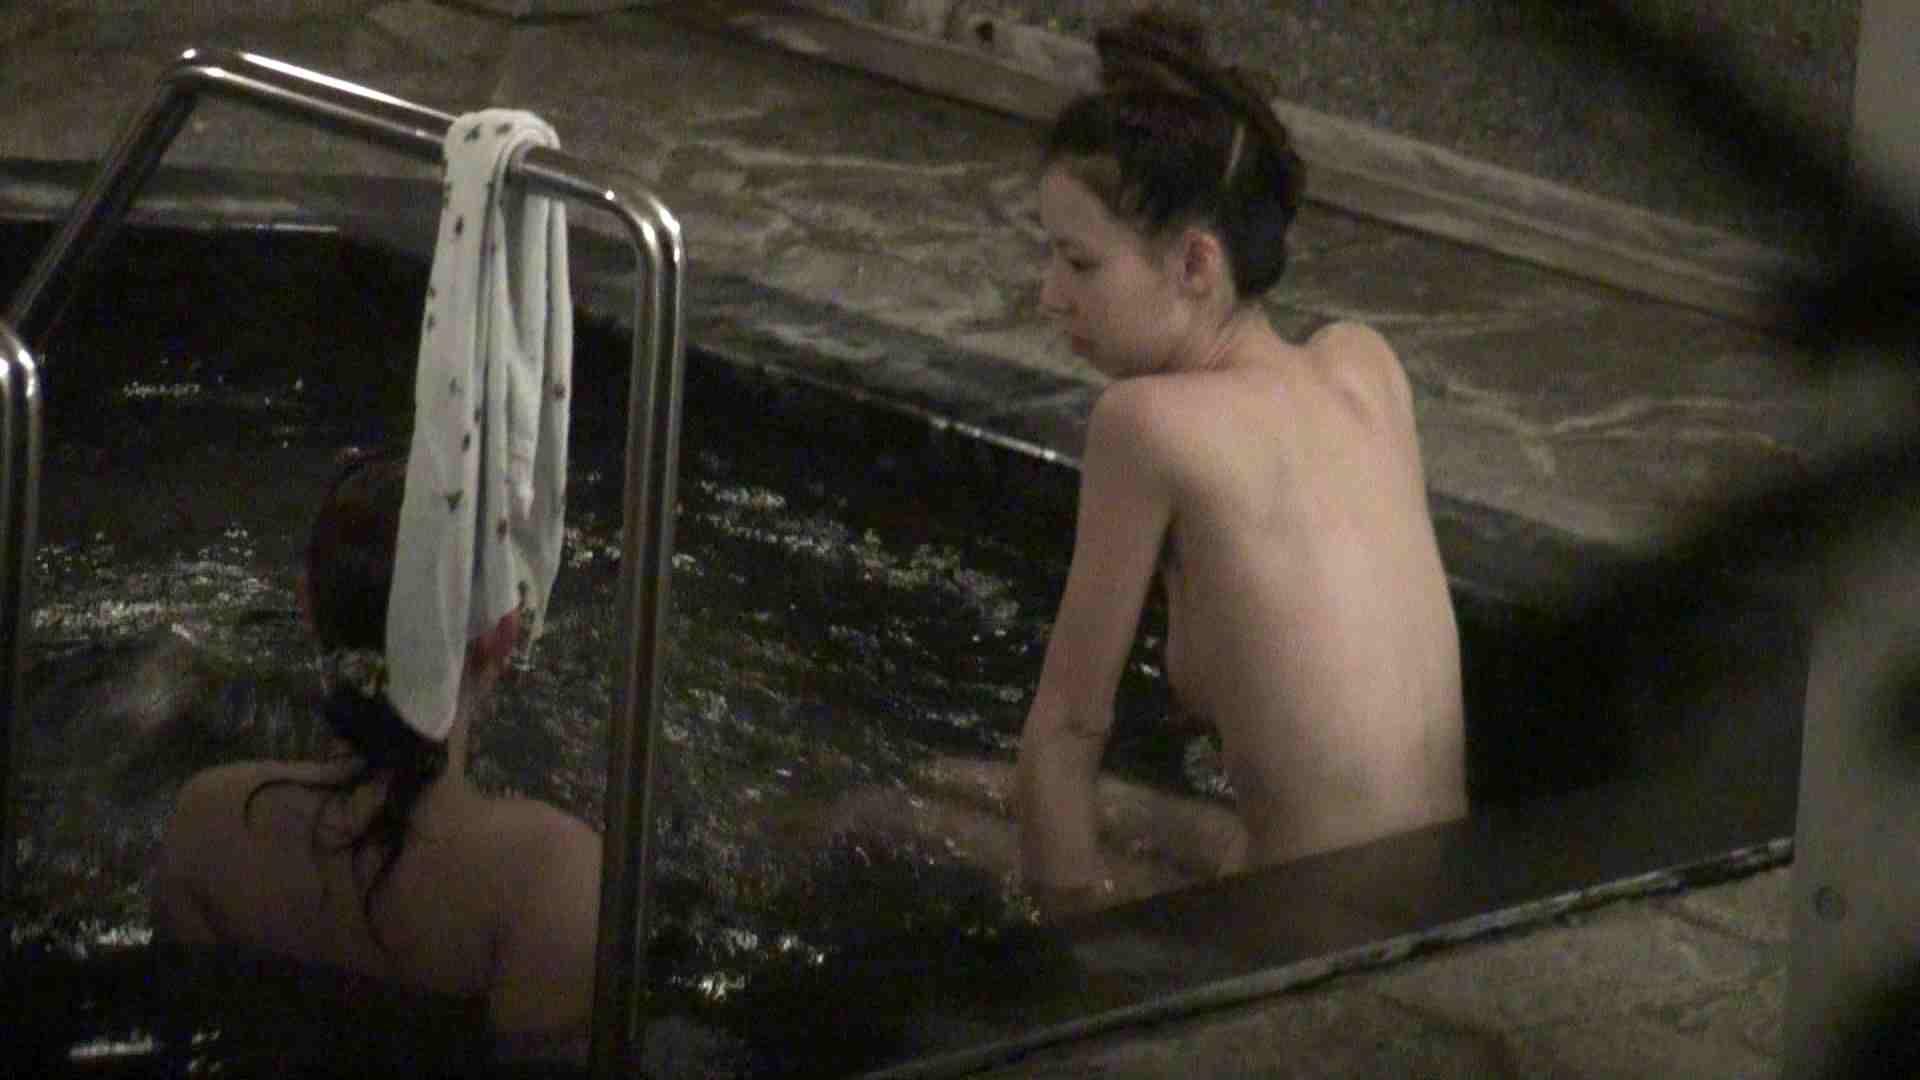 Aquaな露天風呂Vol.359 美しいOLの裸体 AV動画キャプチャ 94pic 50